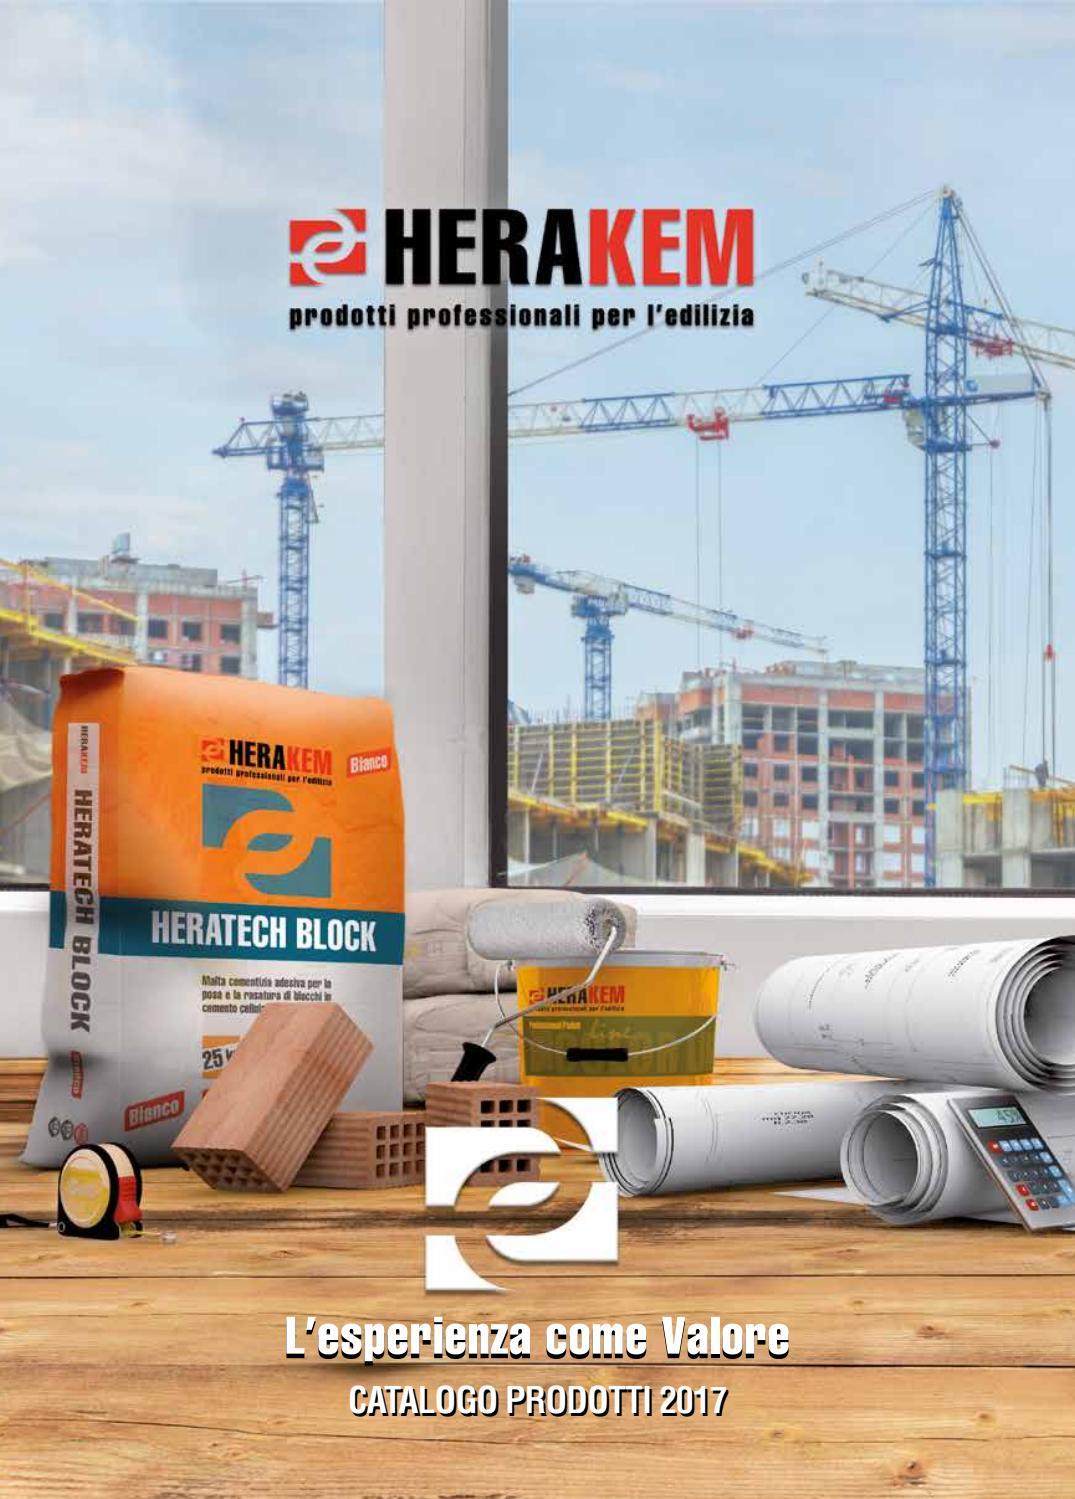 Pittura Granulosa Per Cartongesso catalogo dei prodotti herakem by herakem - issuu